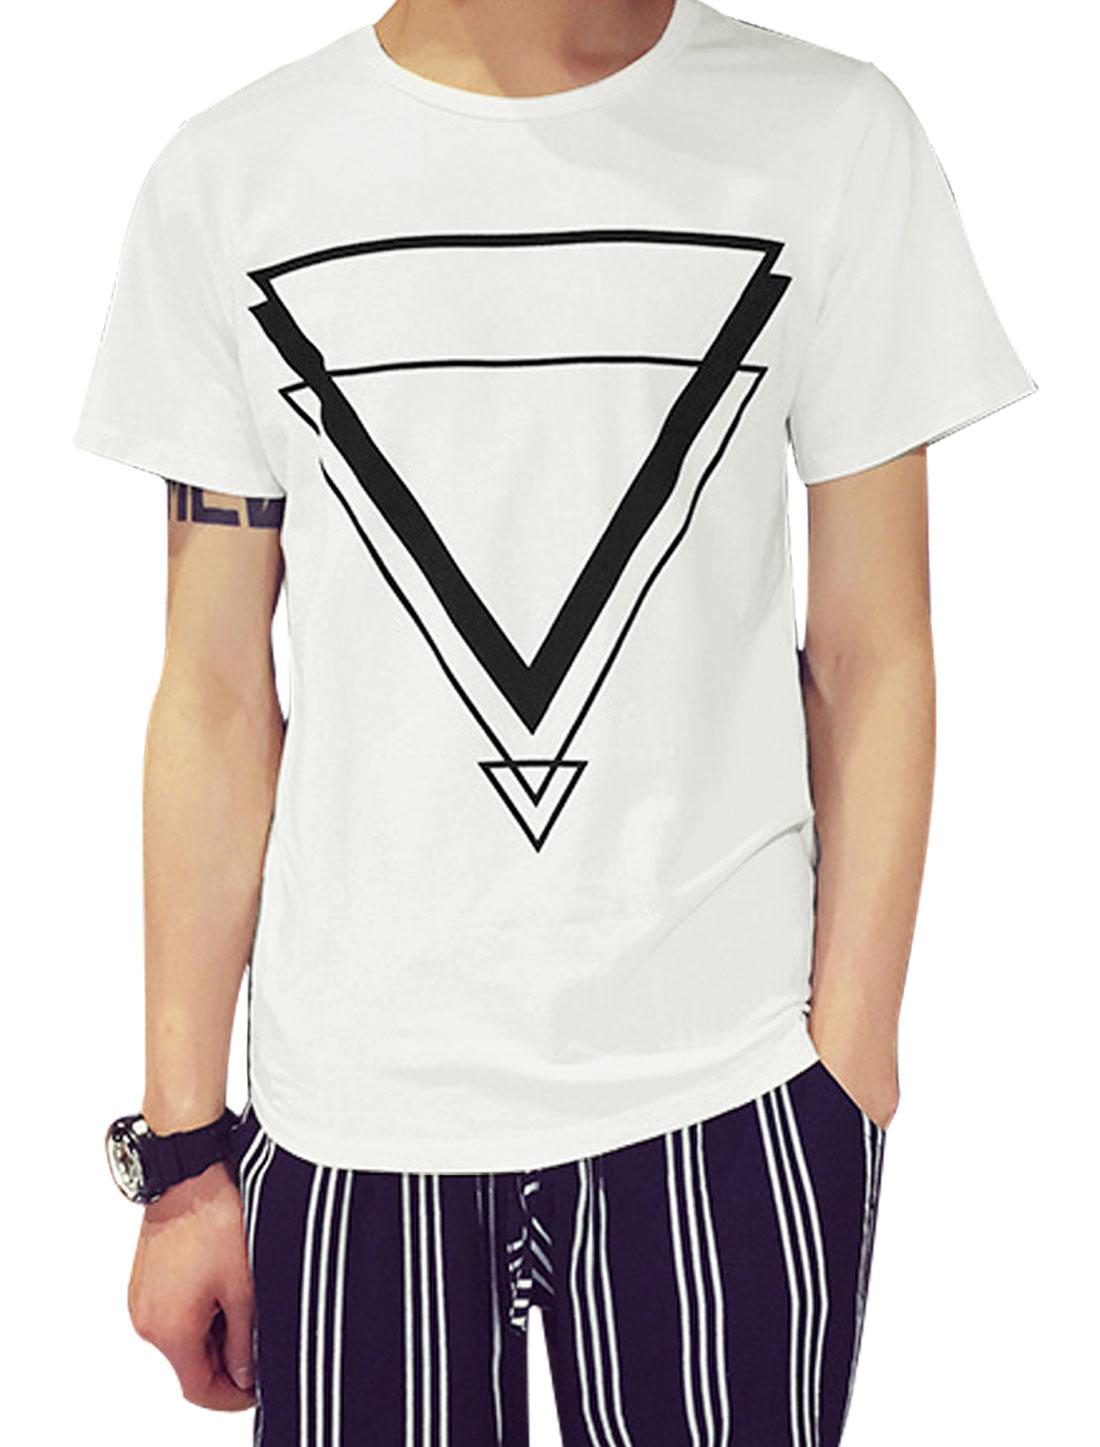 Man Triangle Pattern Round Neck Short Sleeves Leisure Basic Tee White S